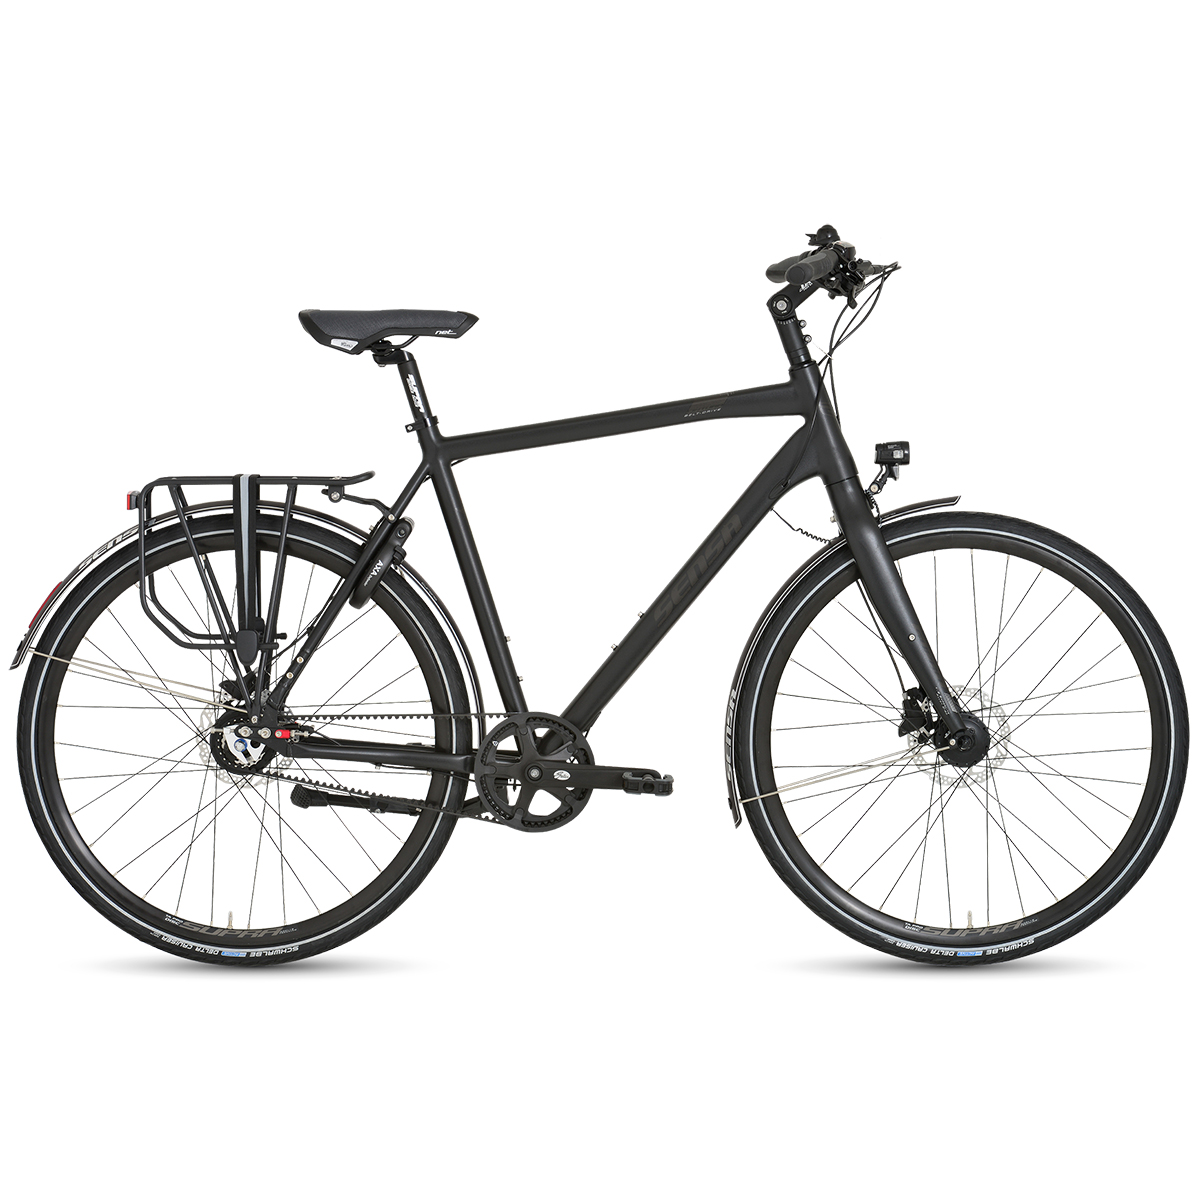 Sensa Cintura Comfort Gents Touring Bike - 2019